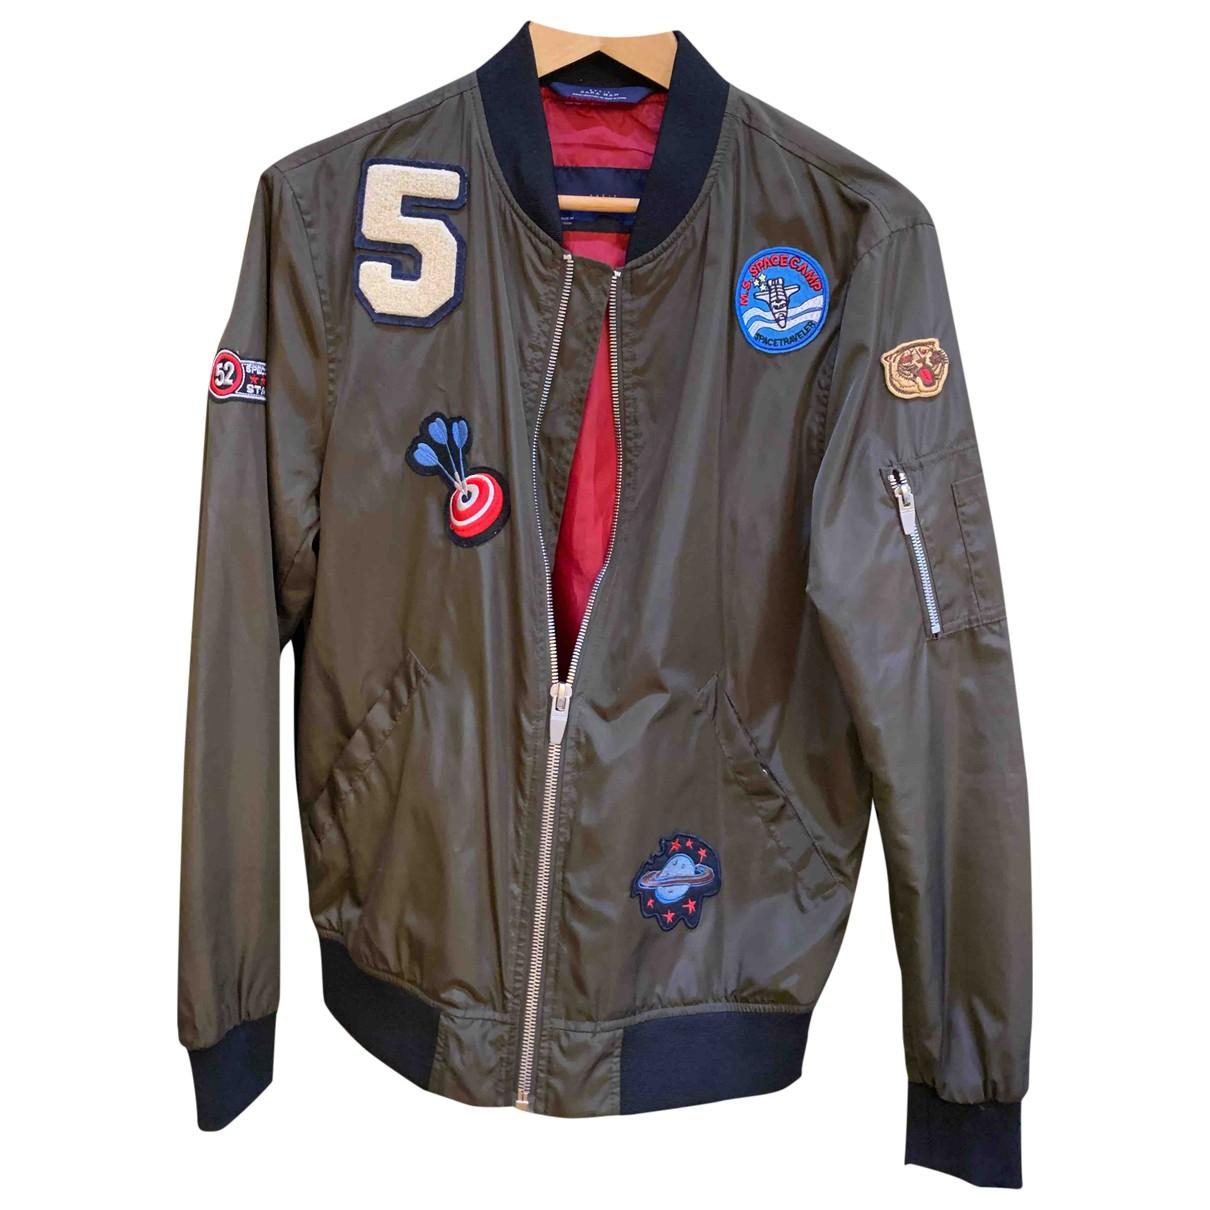 Zara \N Khaki jacket  for Men M International